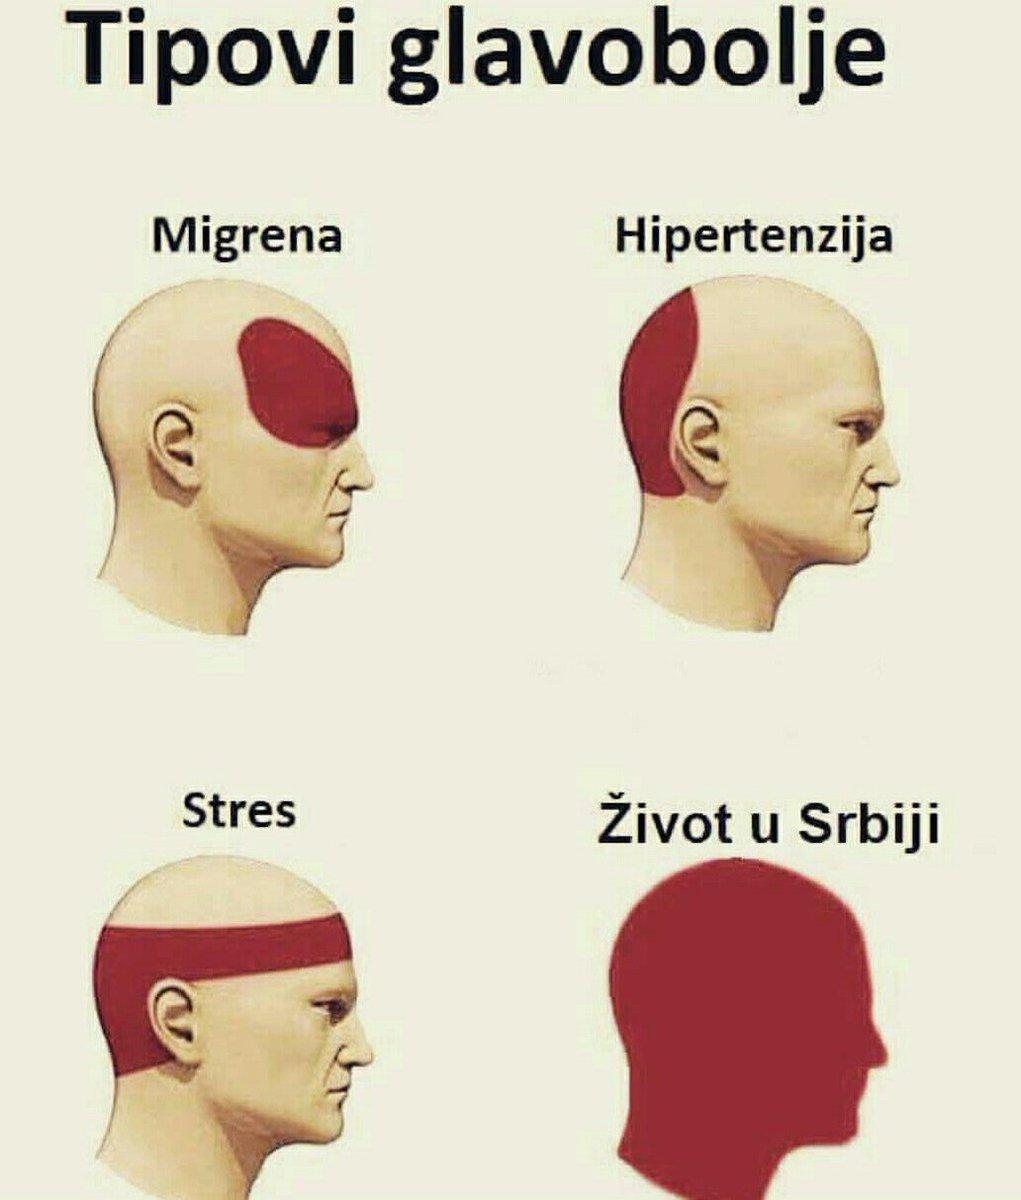 simptomi hipertenzija glavobolja